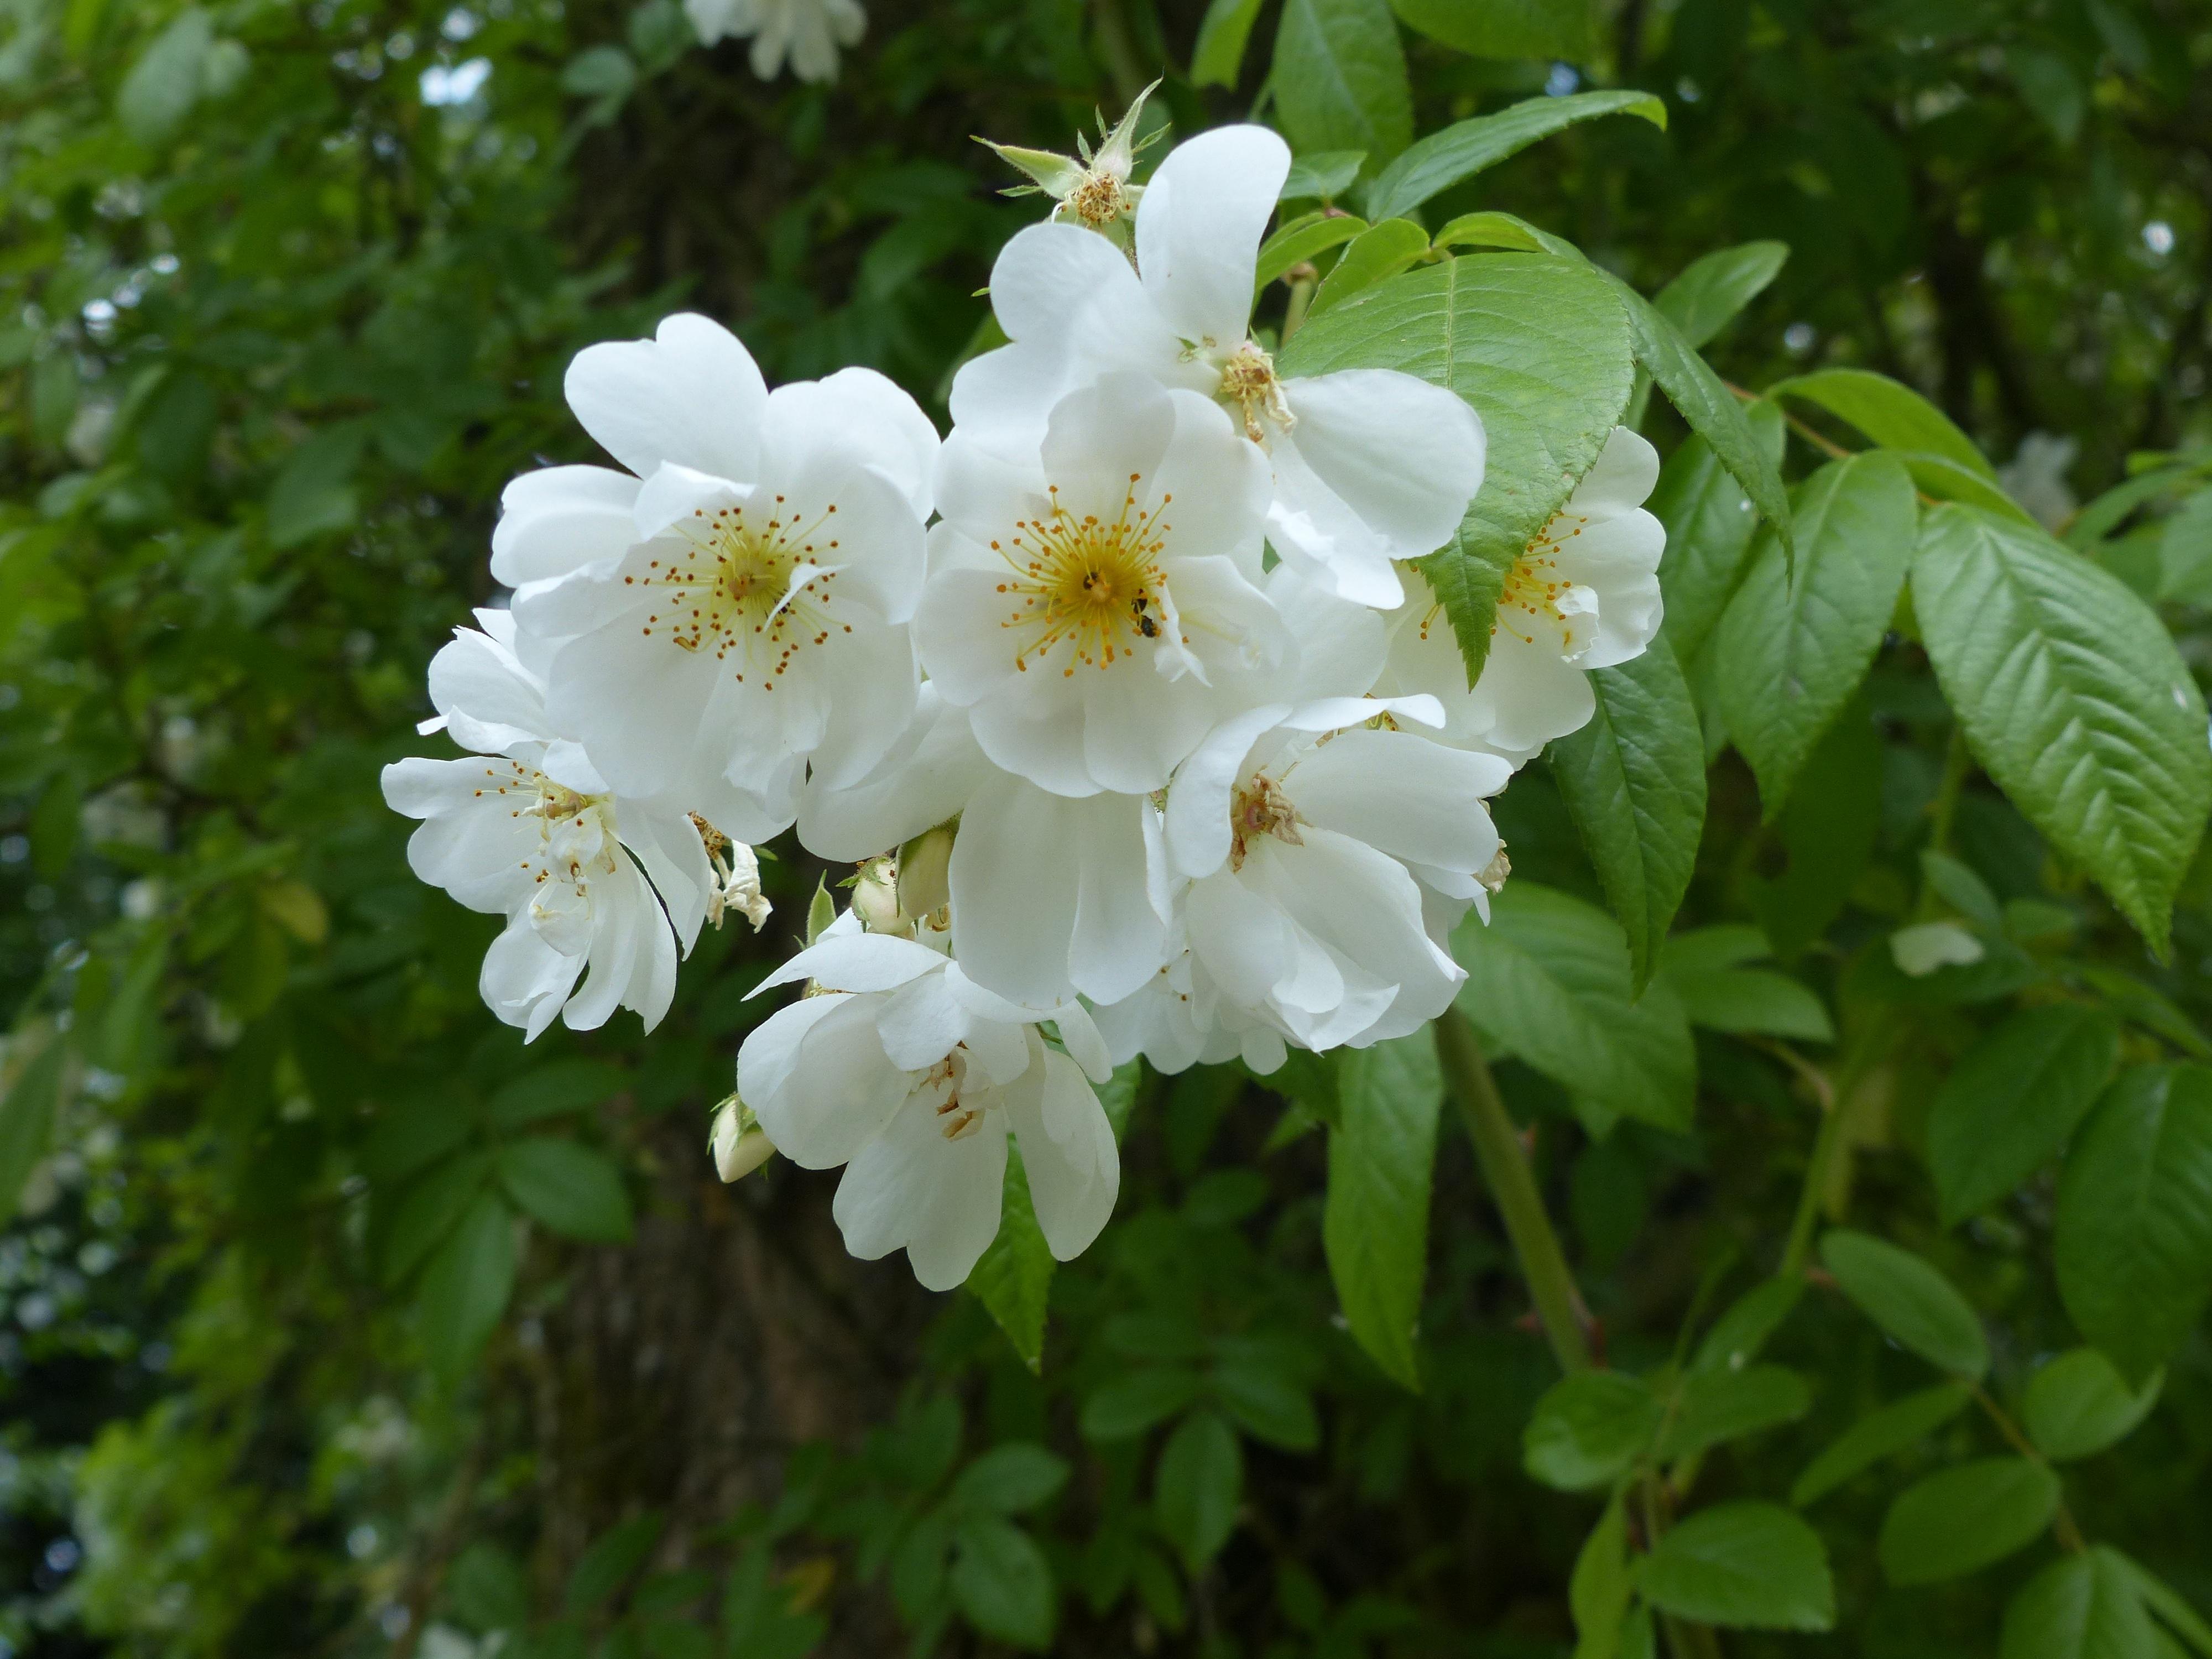 Free Images Tree White Flower Botany Flora Cherry Blossom